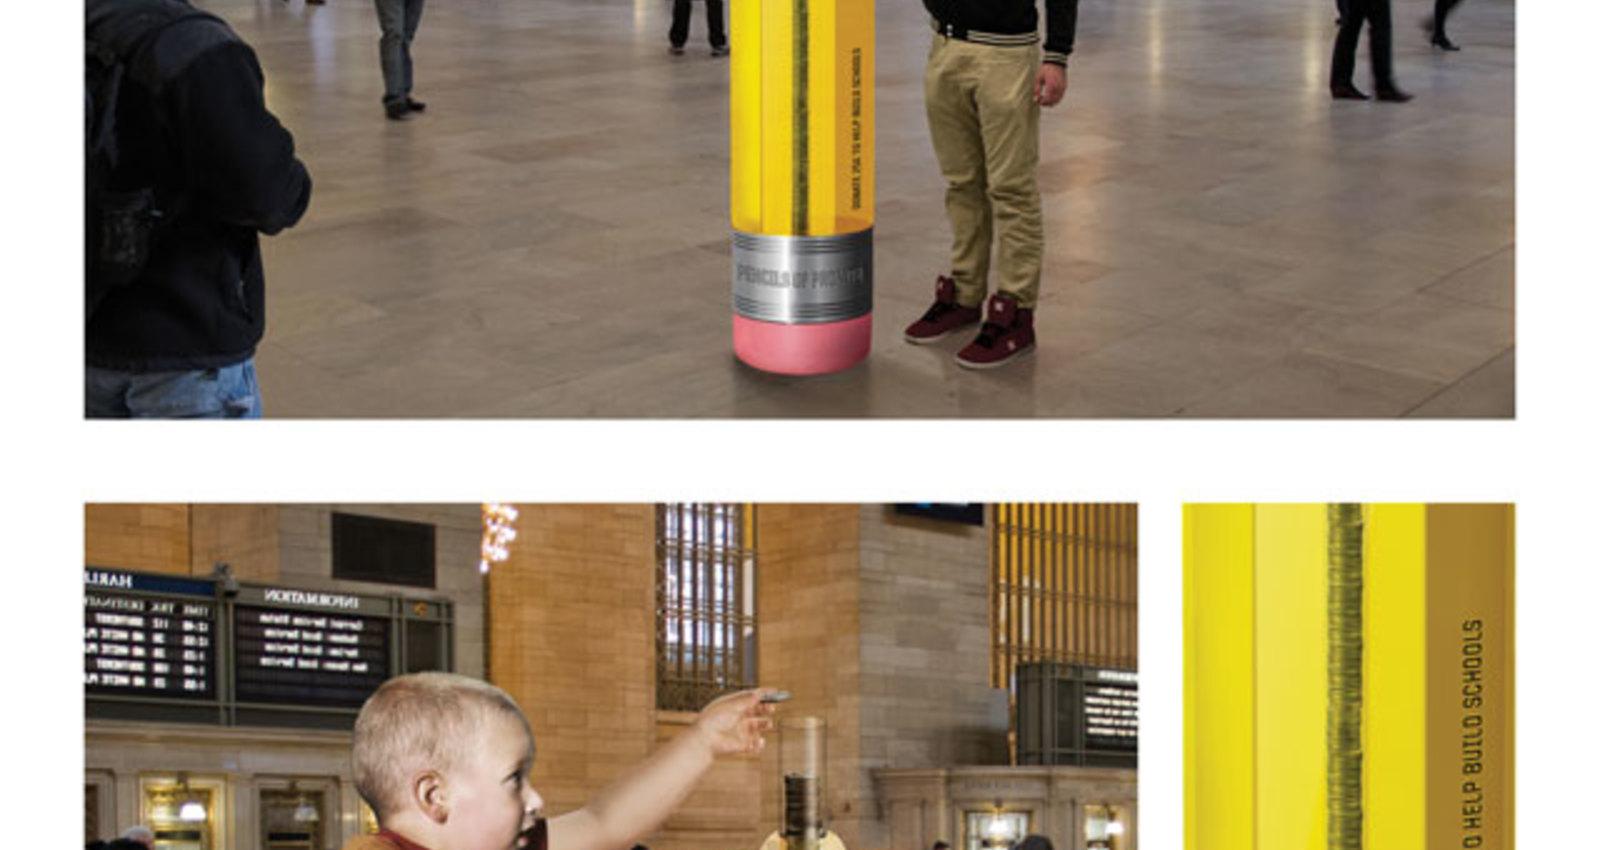 The Donation Pencil